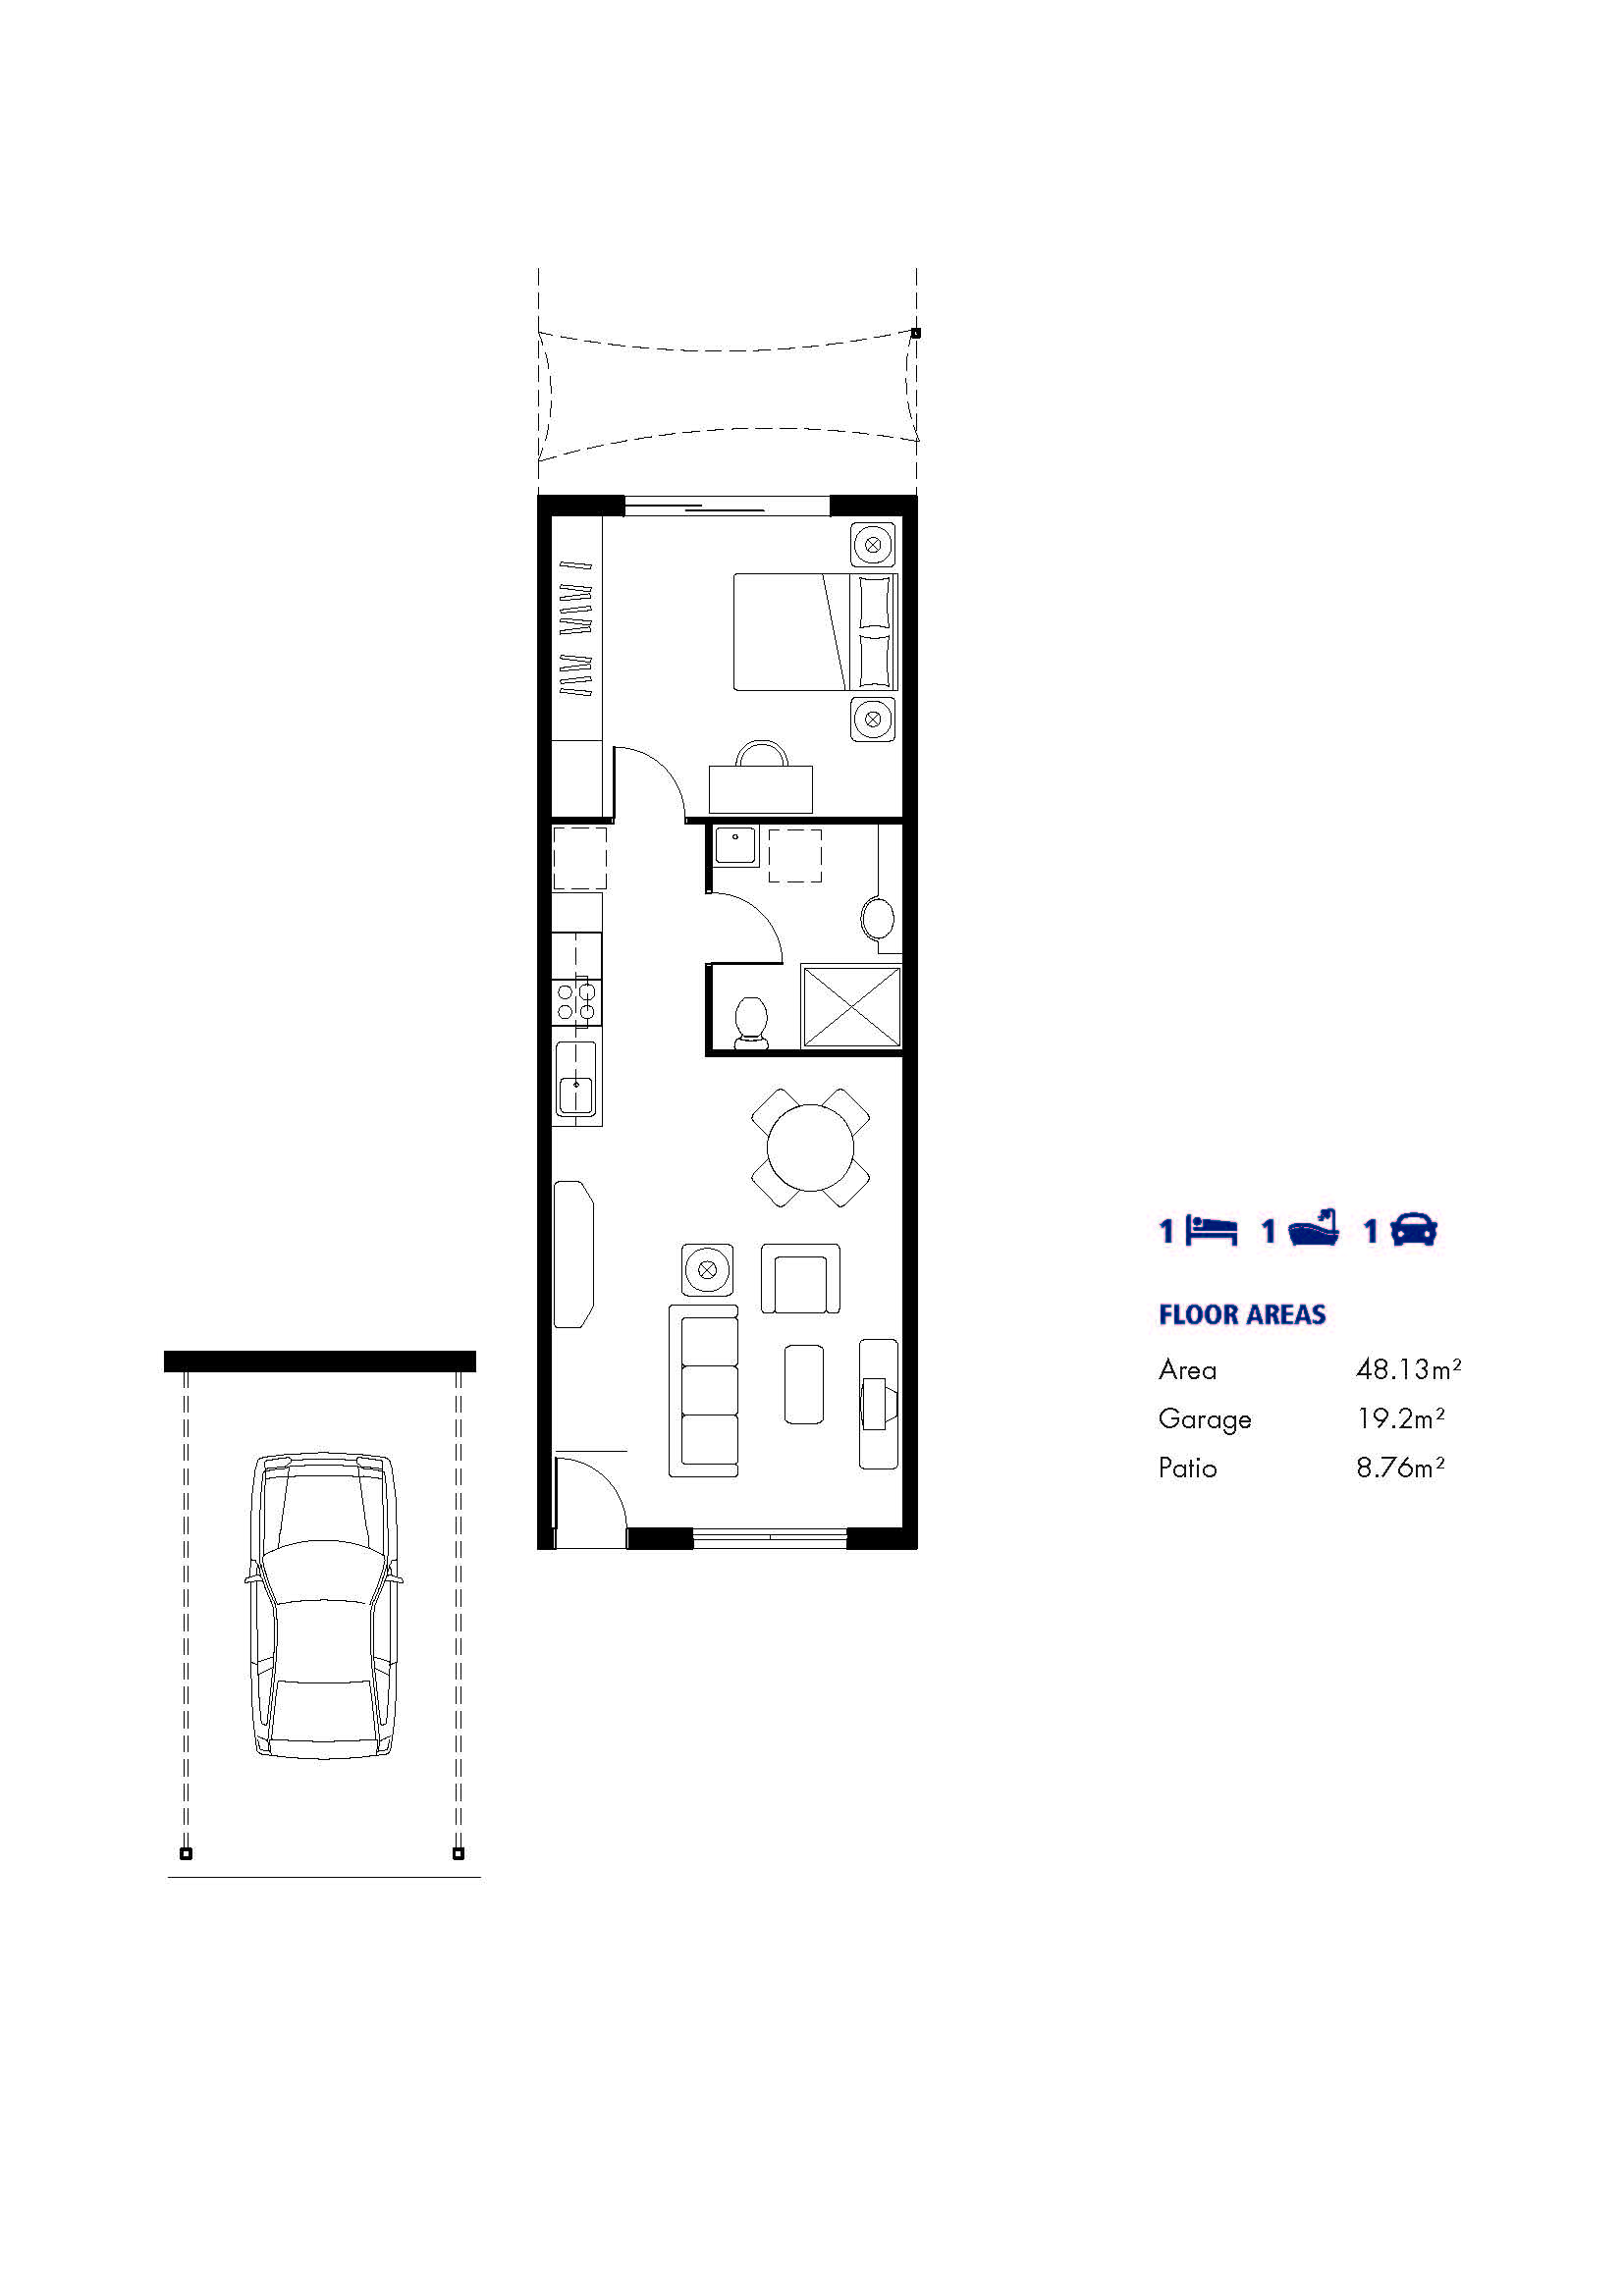 PSD11257_Brooklea_floorplans_Hayman.jpg